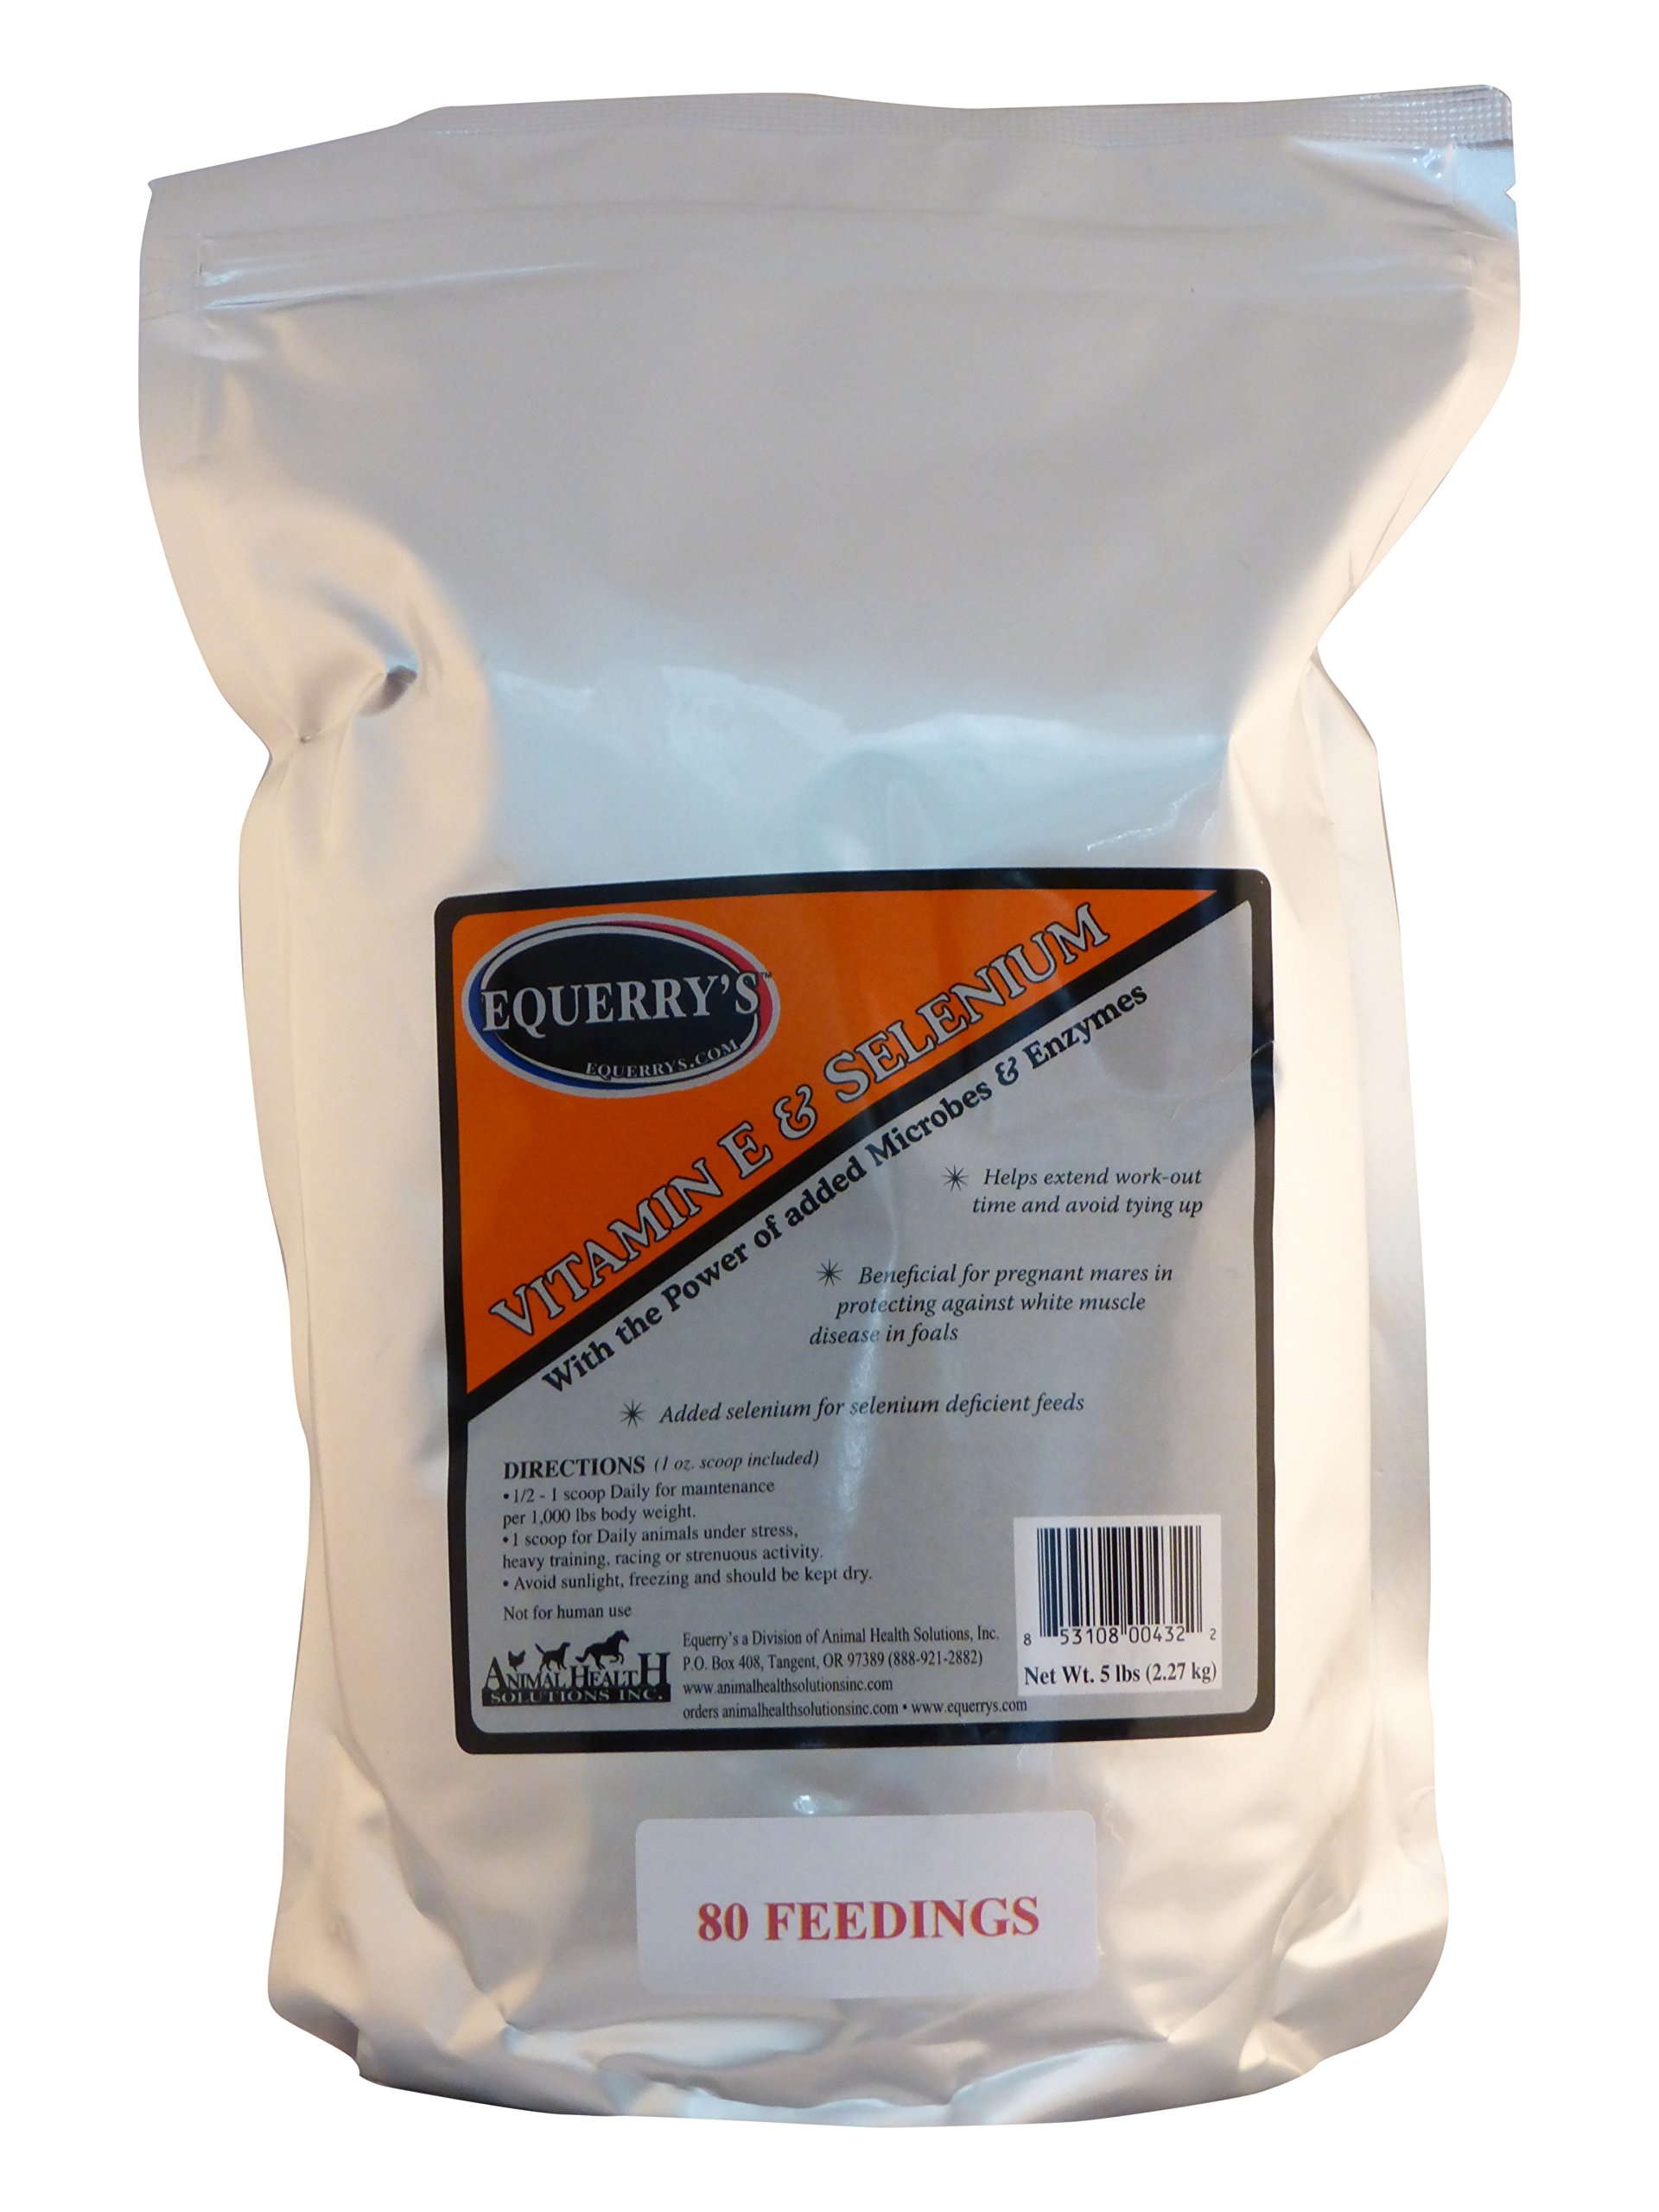 Equerry's Vitamin E and Selenium 1 oz. Provides 2000 IU's of Vitamin E and 2 mg Organic Selenium, 5lb. by Equerry's